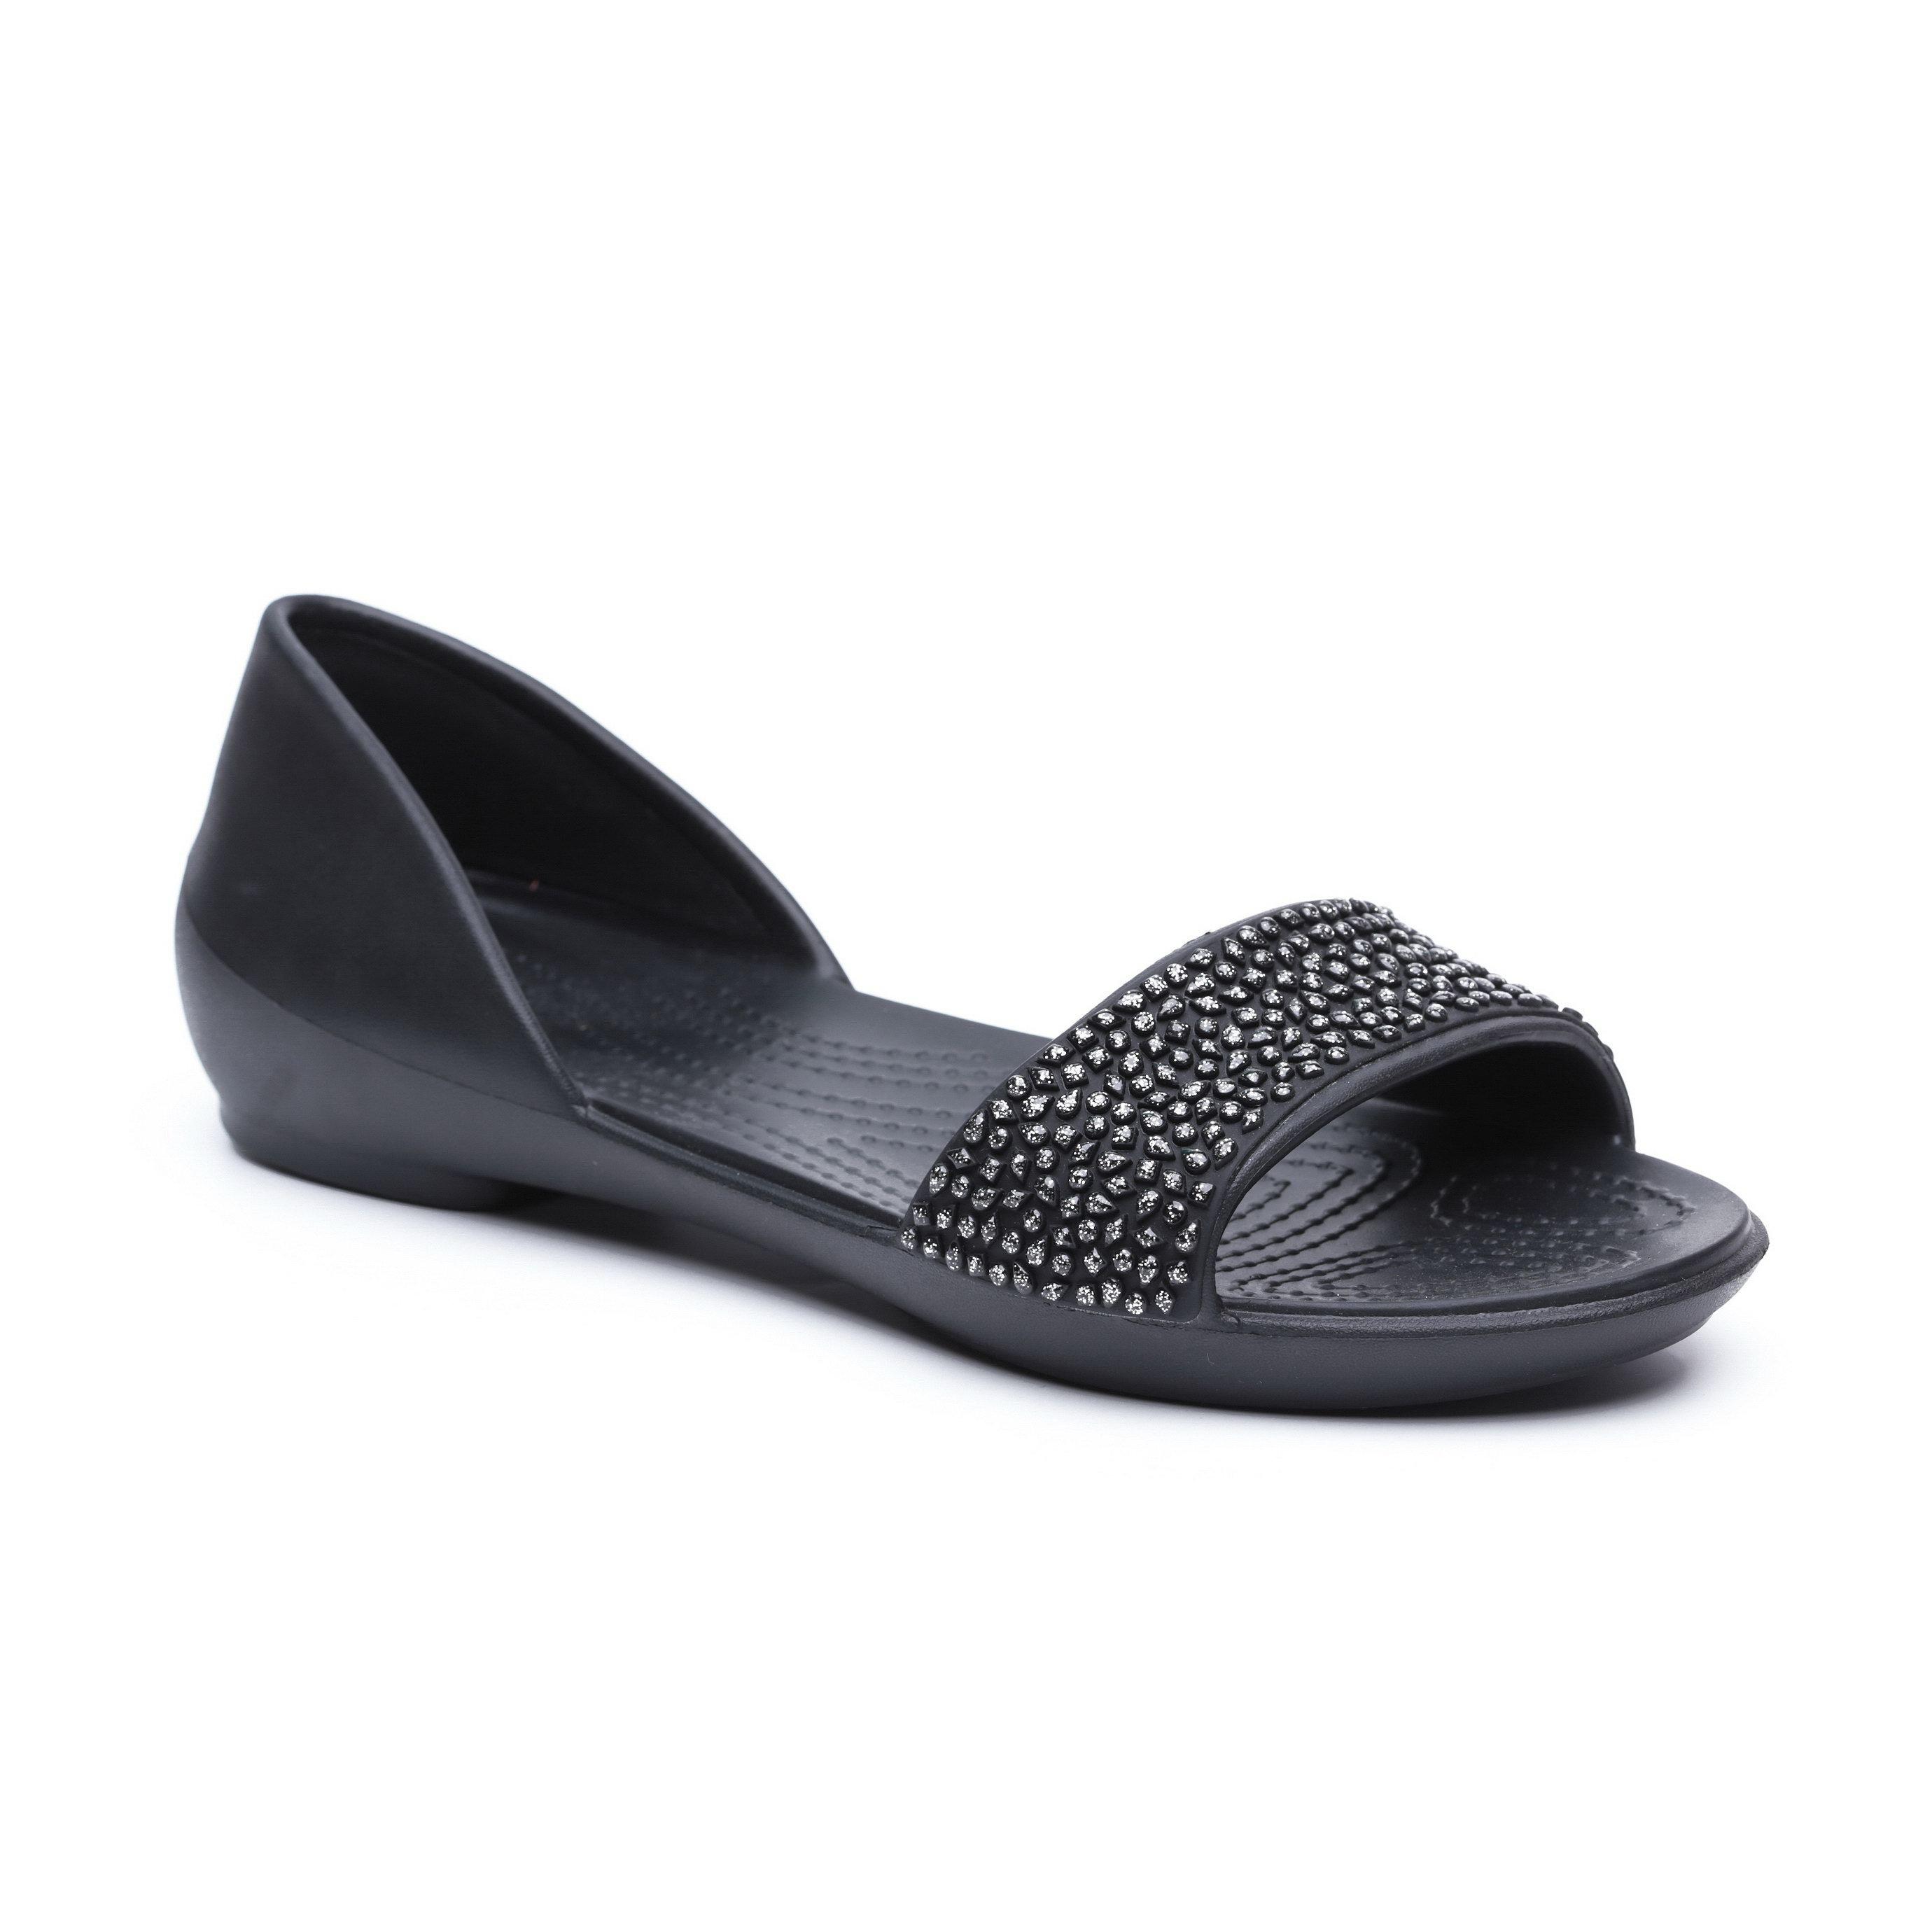 Crocs Lina Embellished Dorsay - סנדלים שחורים לנשים עם רצועה מקושטת